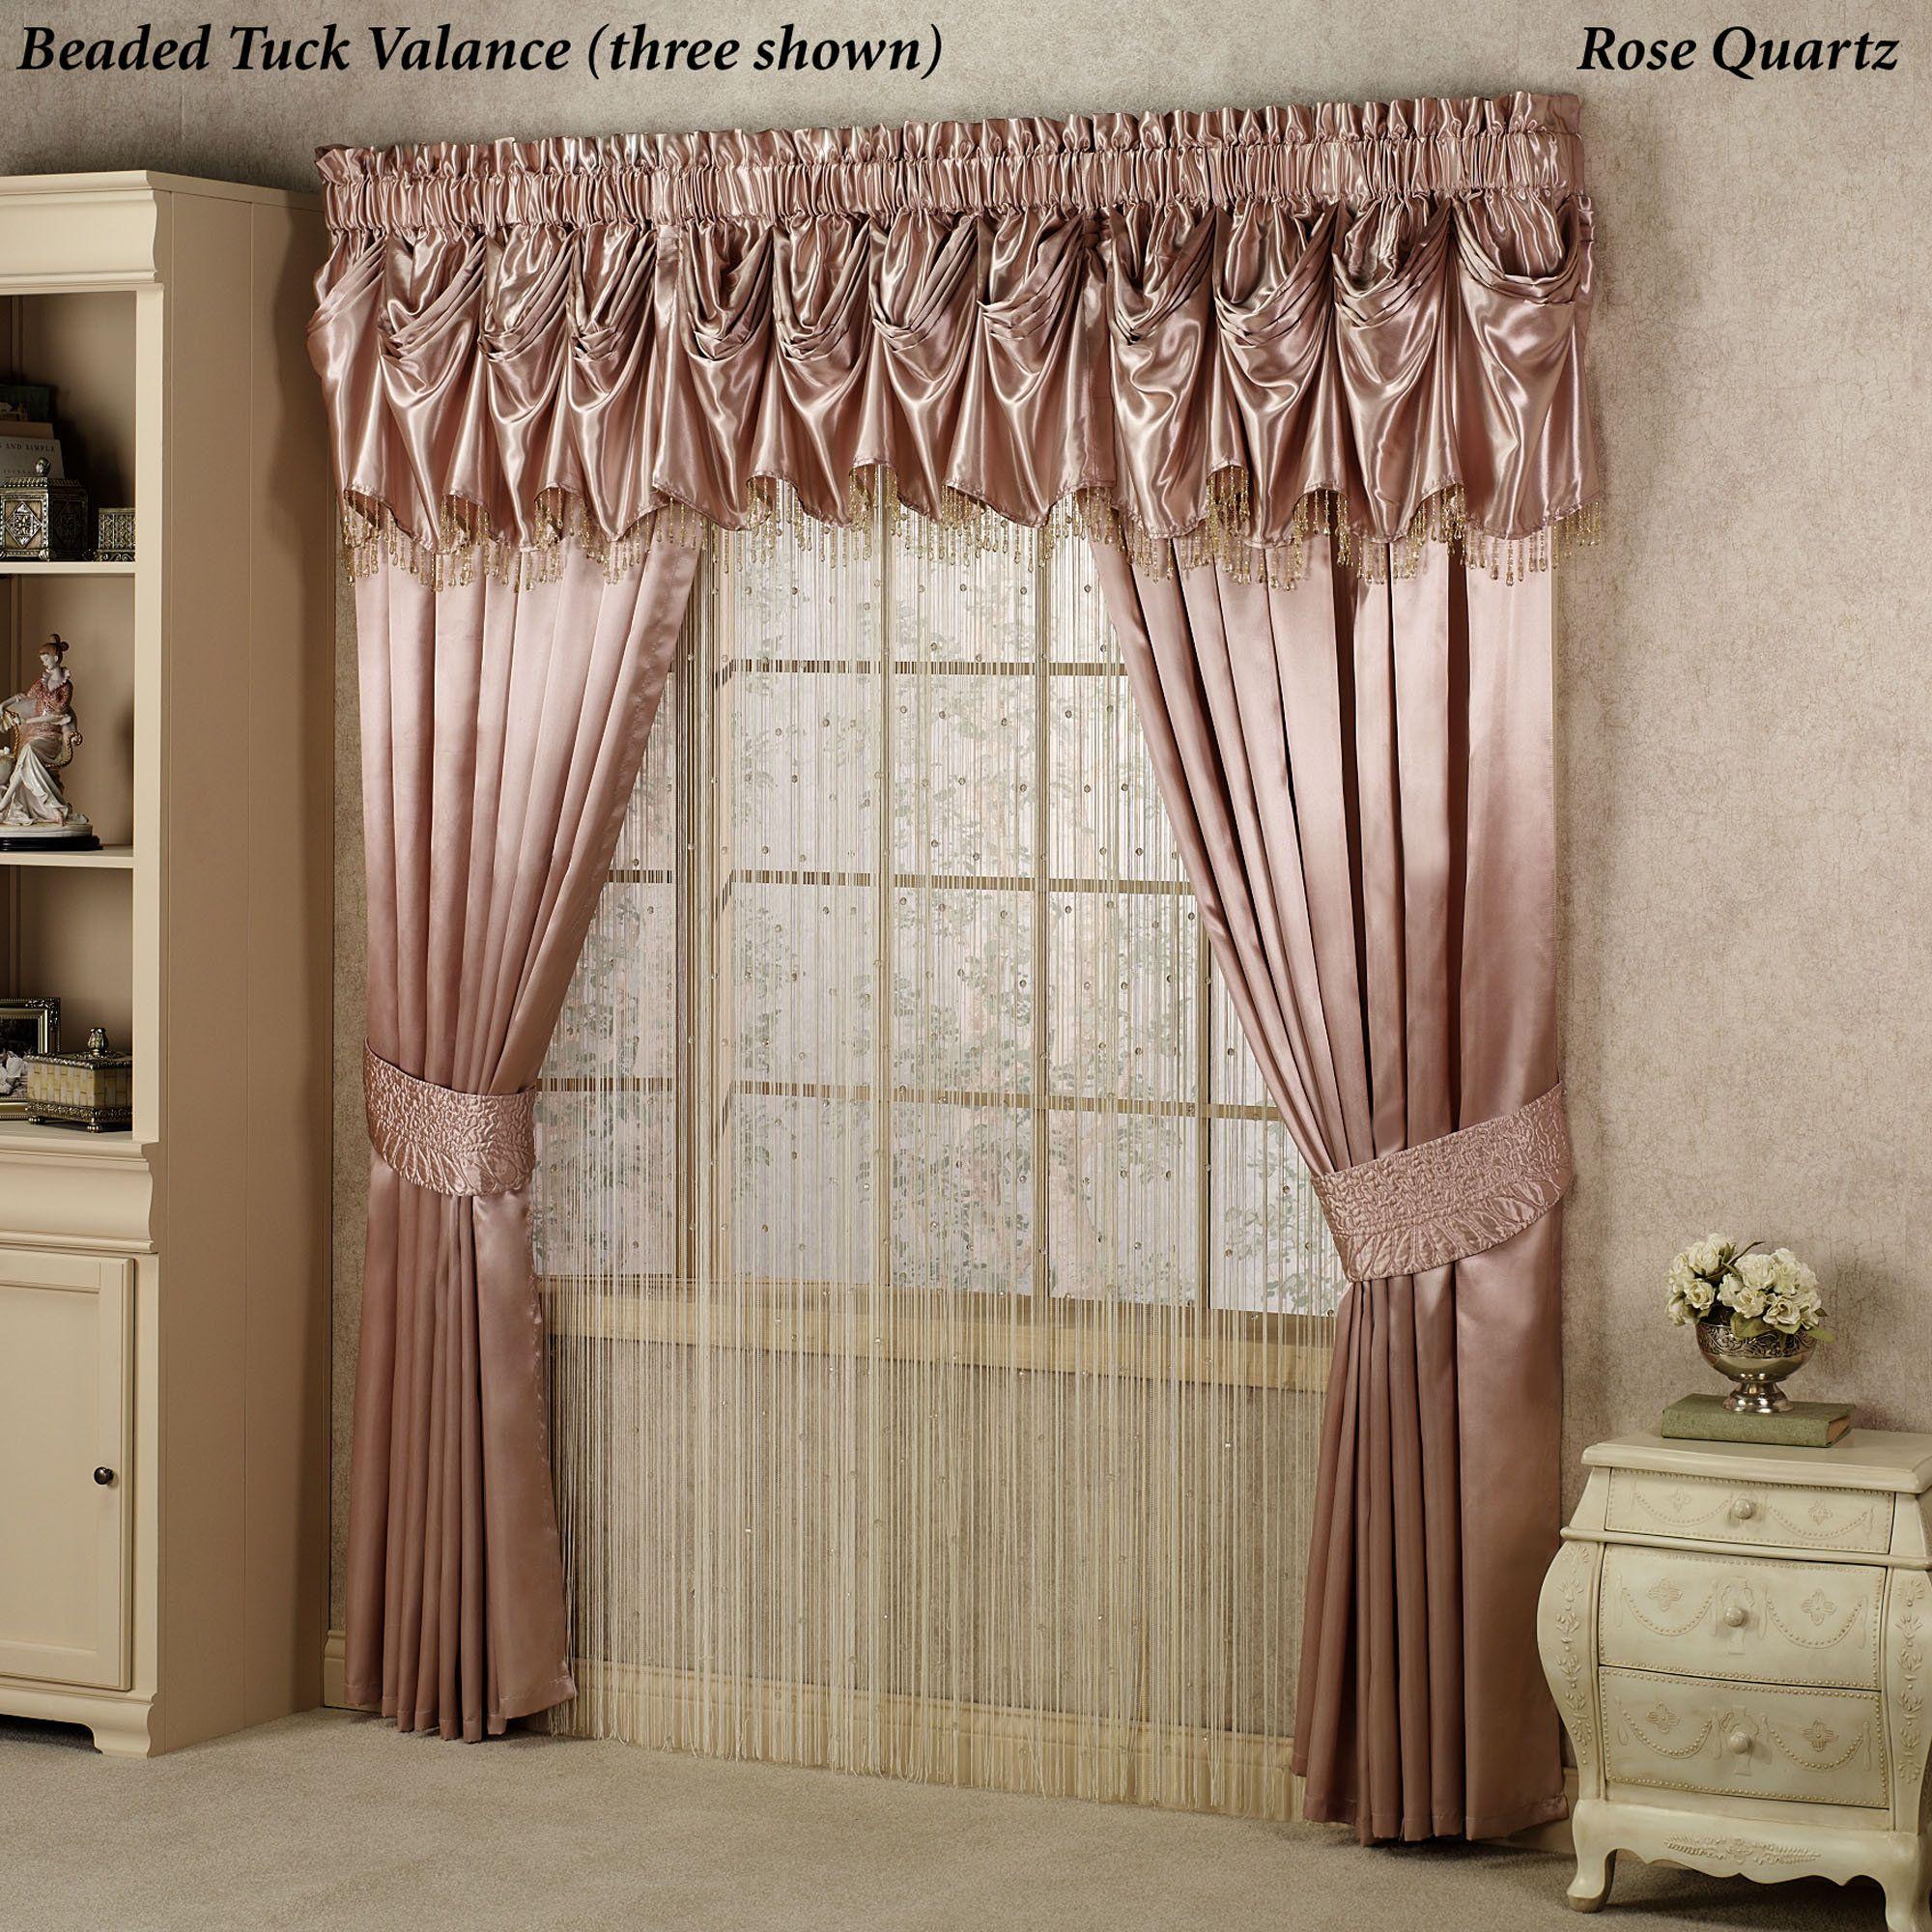 Portia Wide Curtains With Sash Tiebacks Wide Curtains Curtains Ombre Curtains